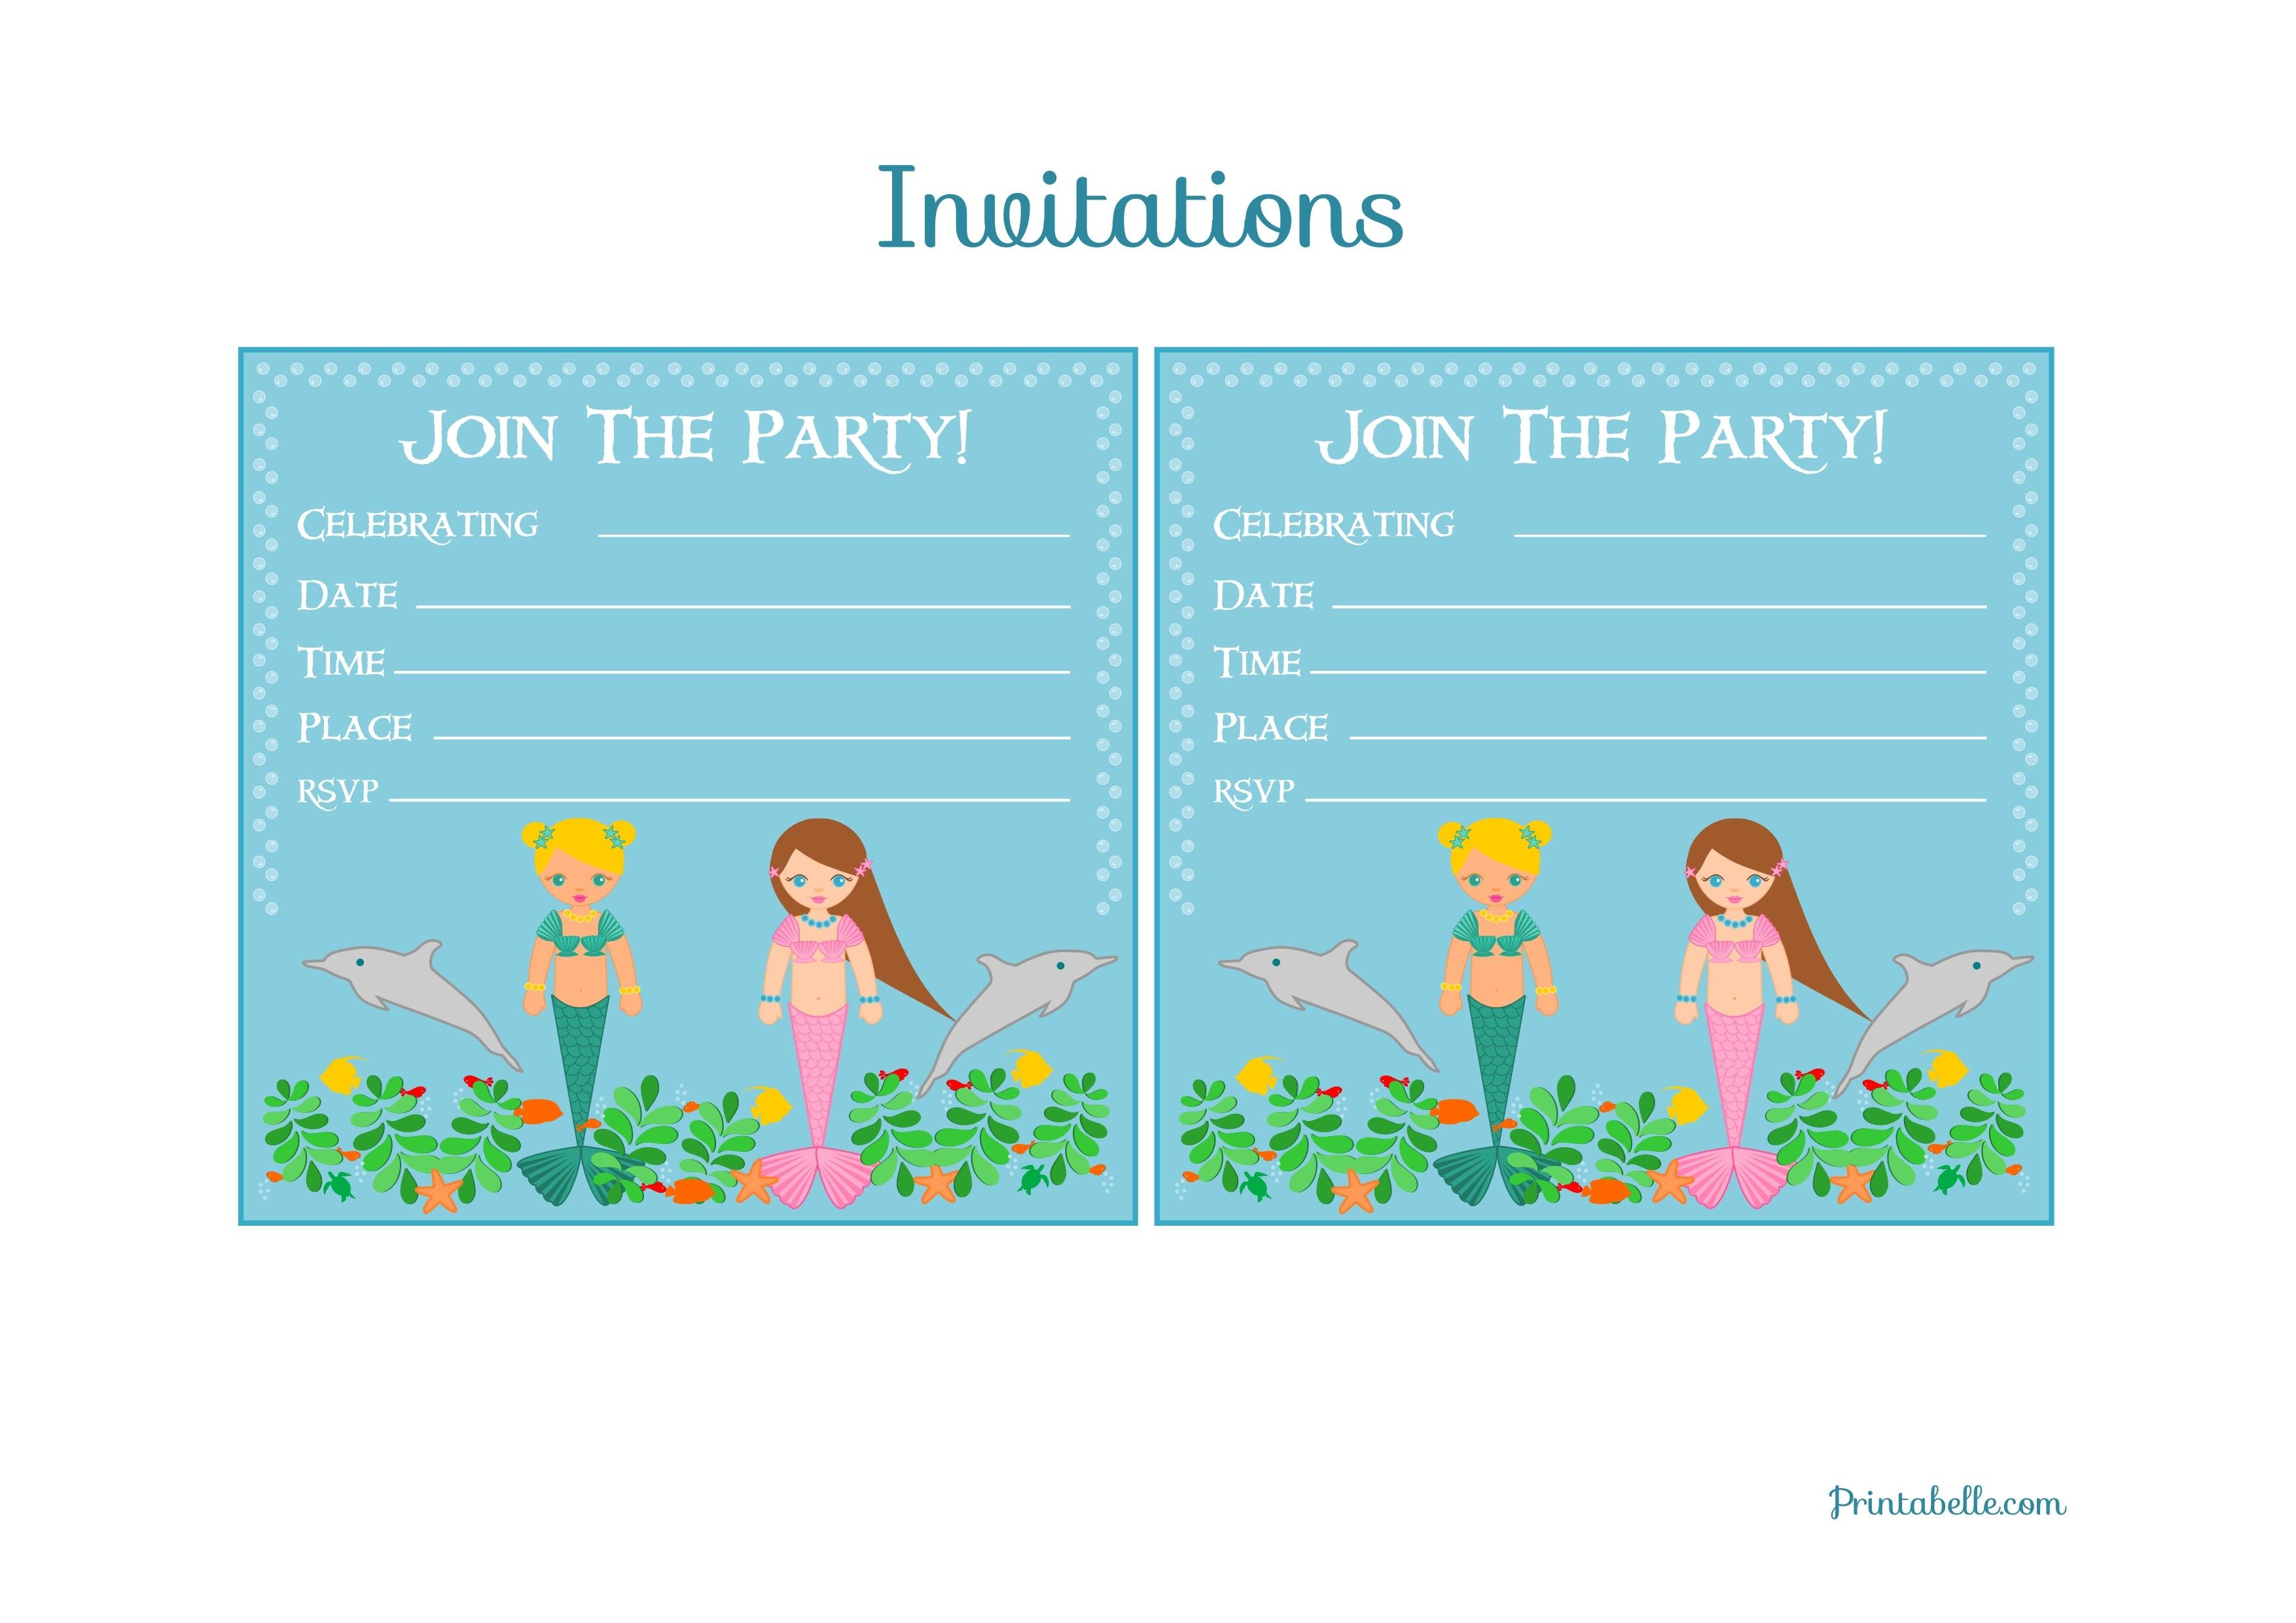 Free Mermaid Birthday Party Printables From Printabelle | Catch My Party - Mermaid Birthday Invitations Free Printable